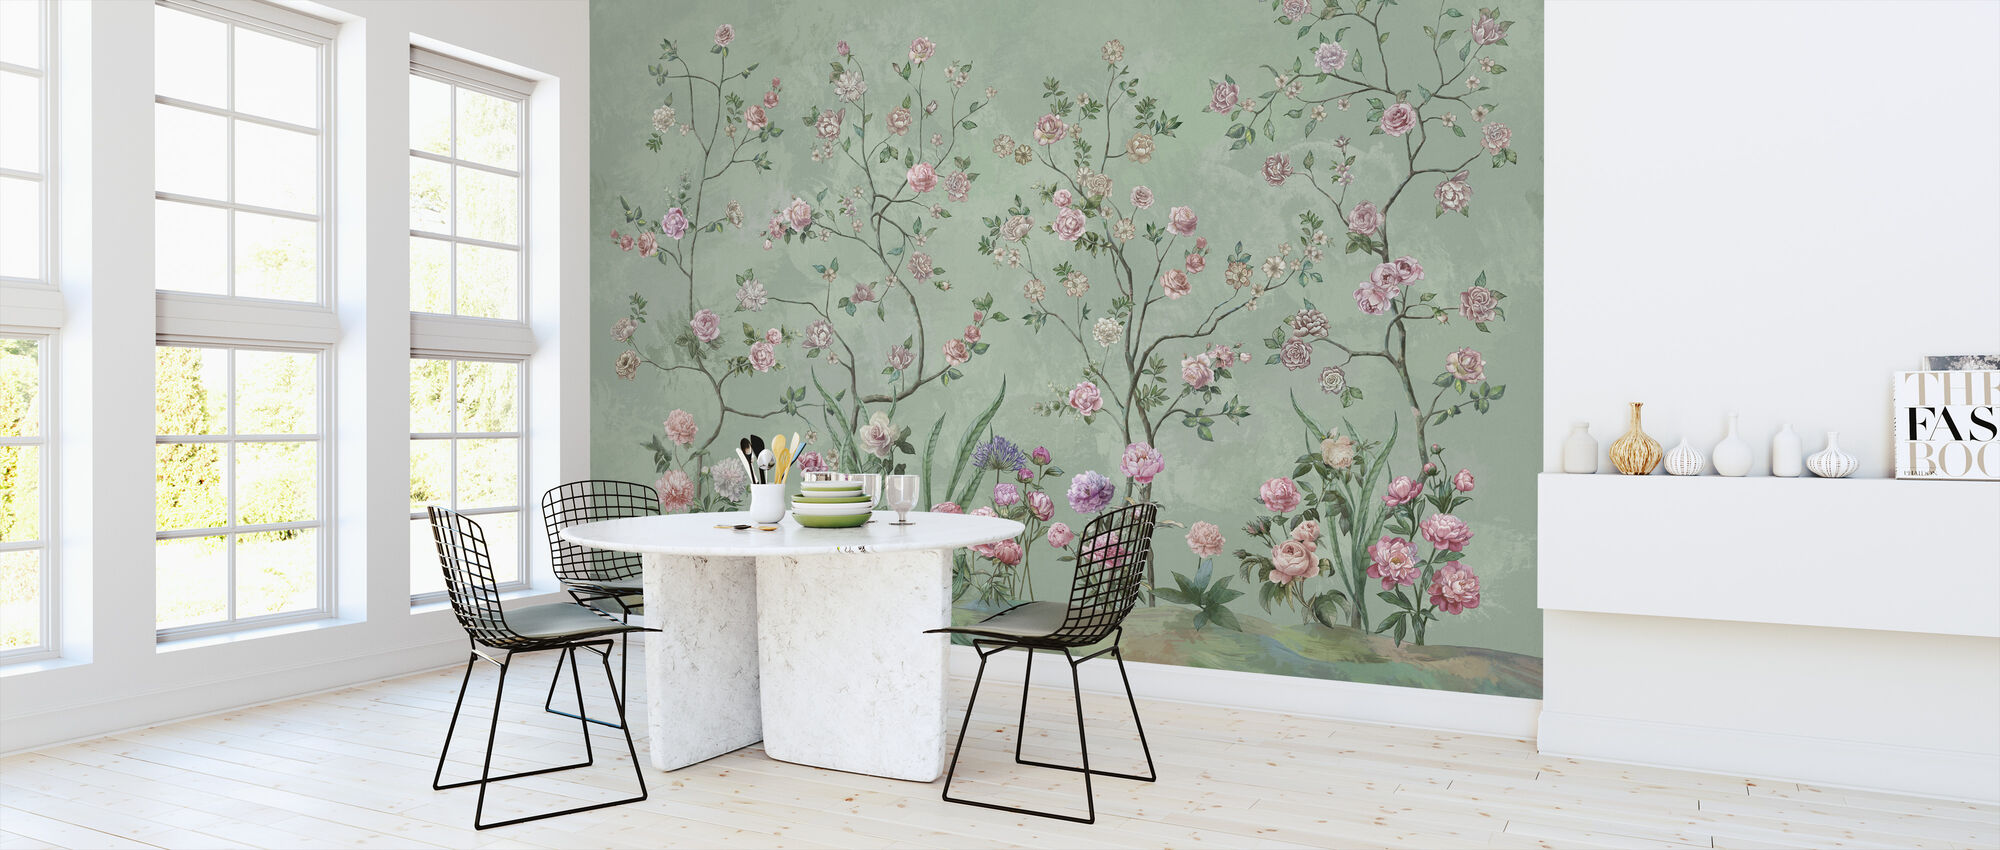 Flowers Patio - Wallpaper - Kitchen